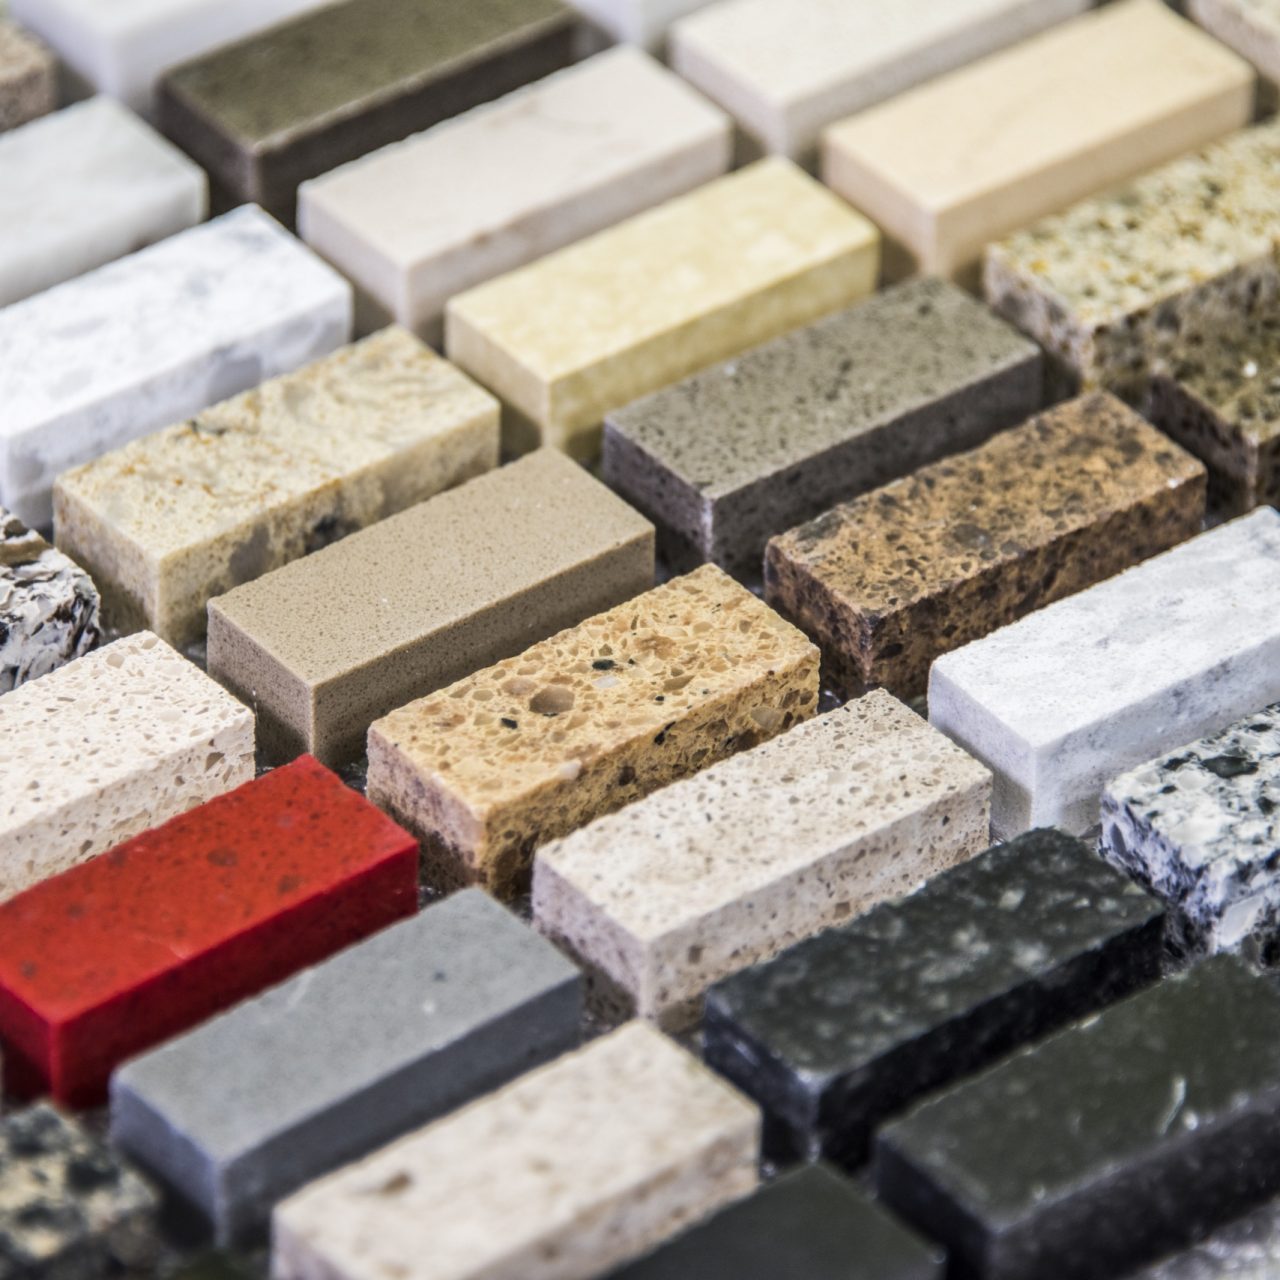 https://orbis-stone.com/wp-content/uploads/2018/09/granit_iskusstvenniy-1280x1280.jpg